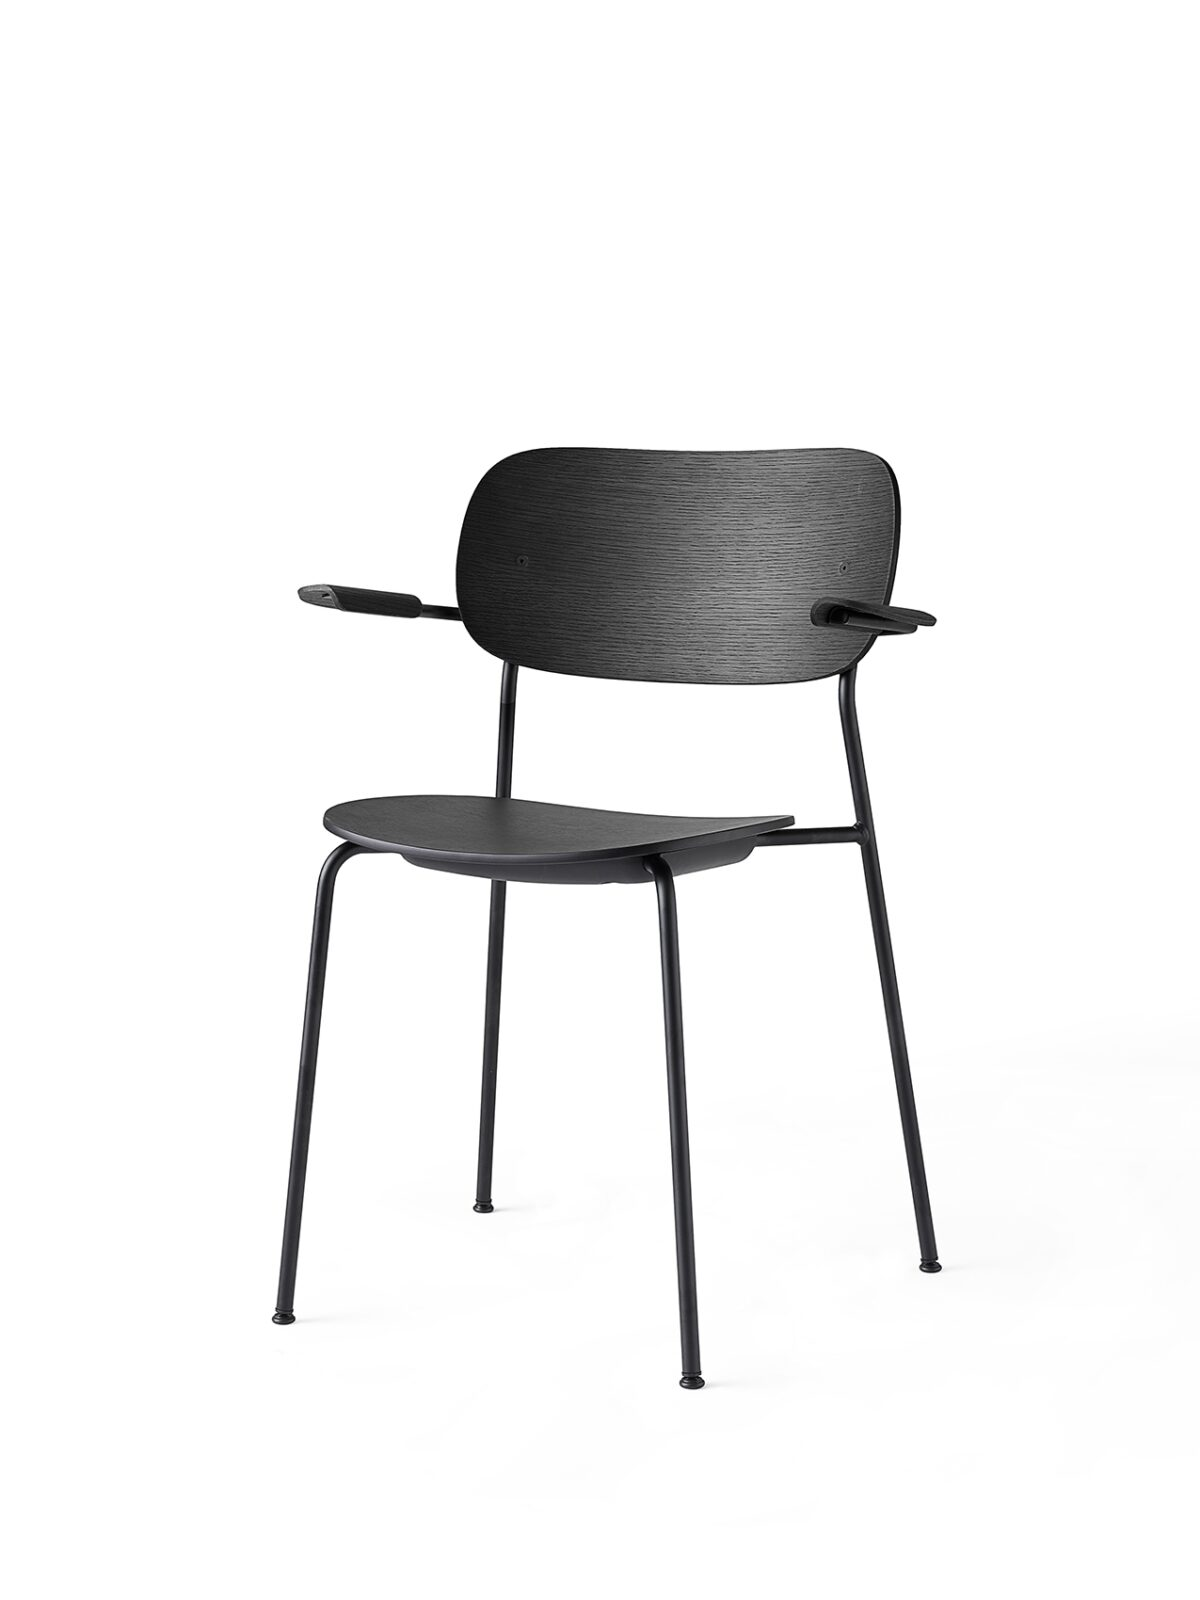 1166539 Co Chair Black Base Black Oak w Armrest 3 2